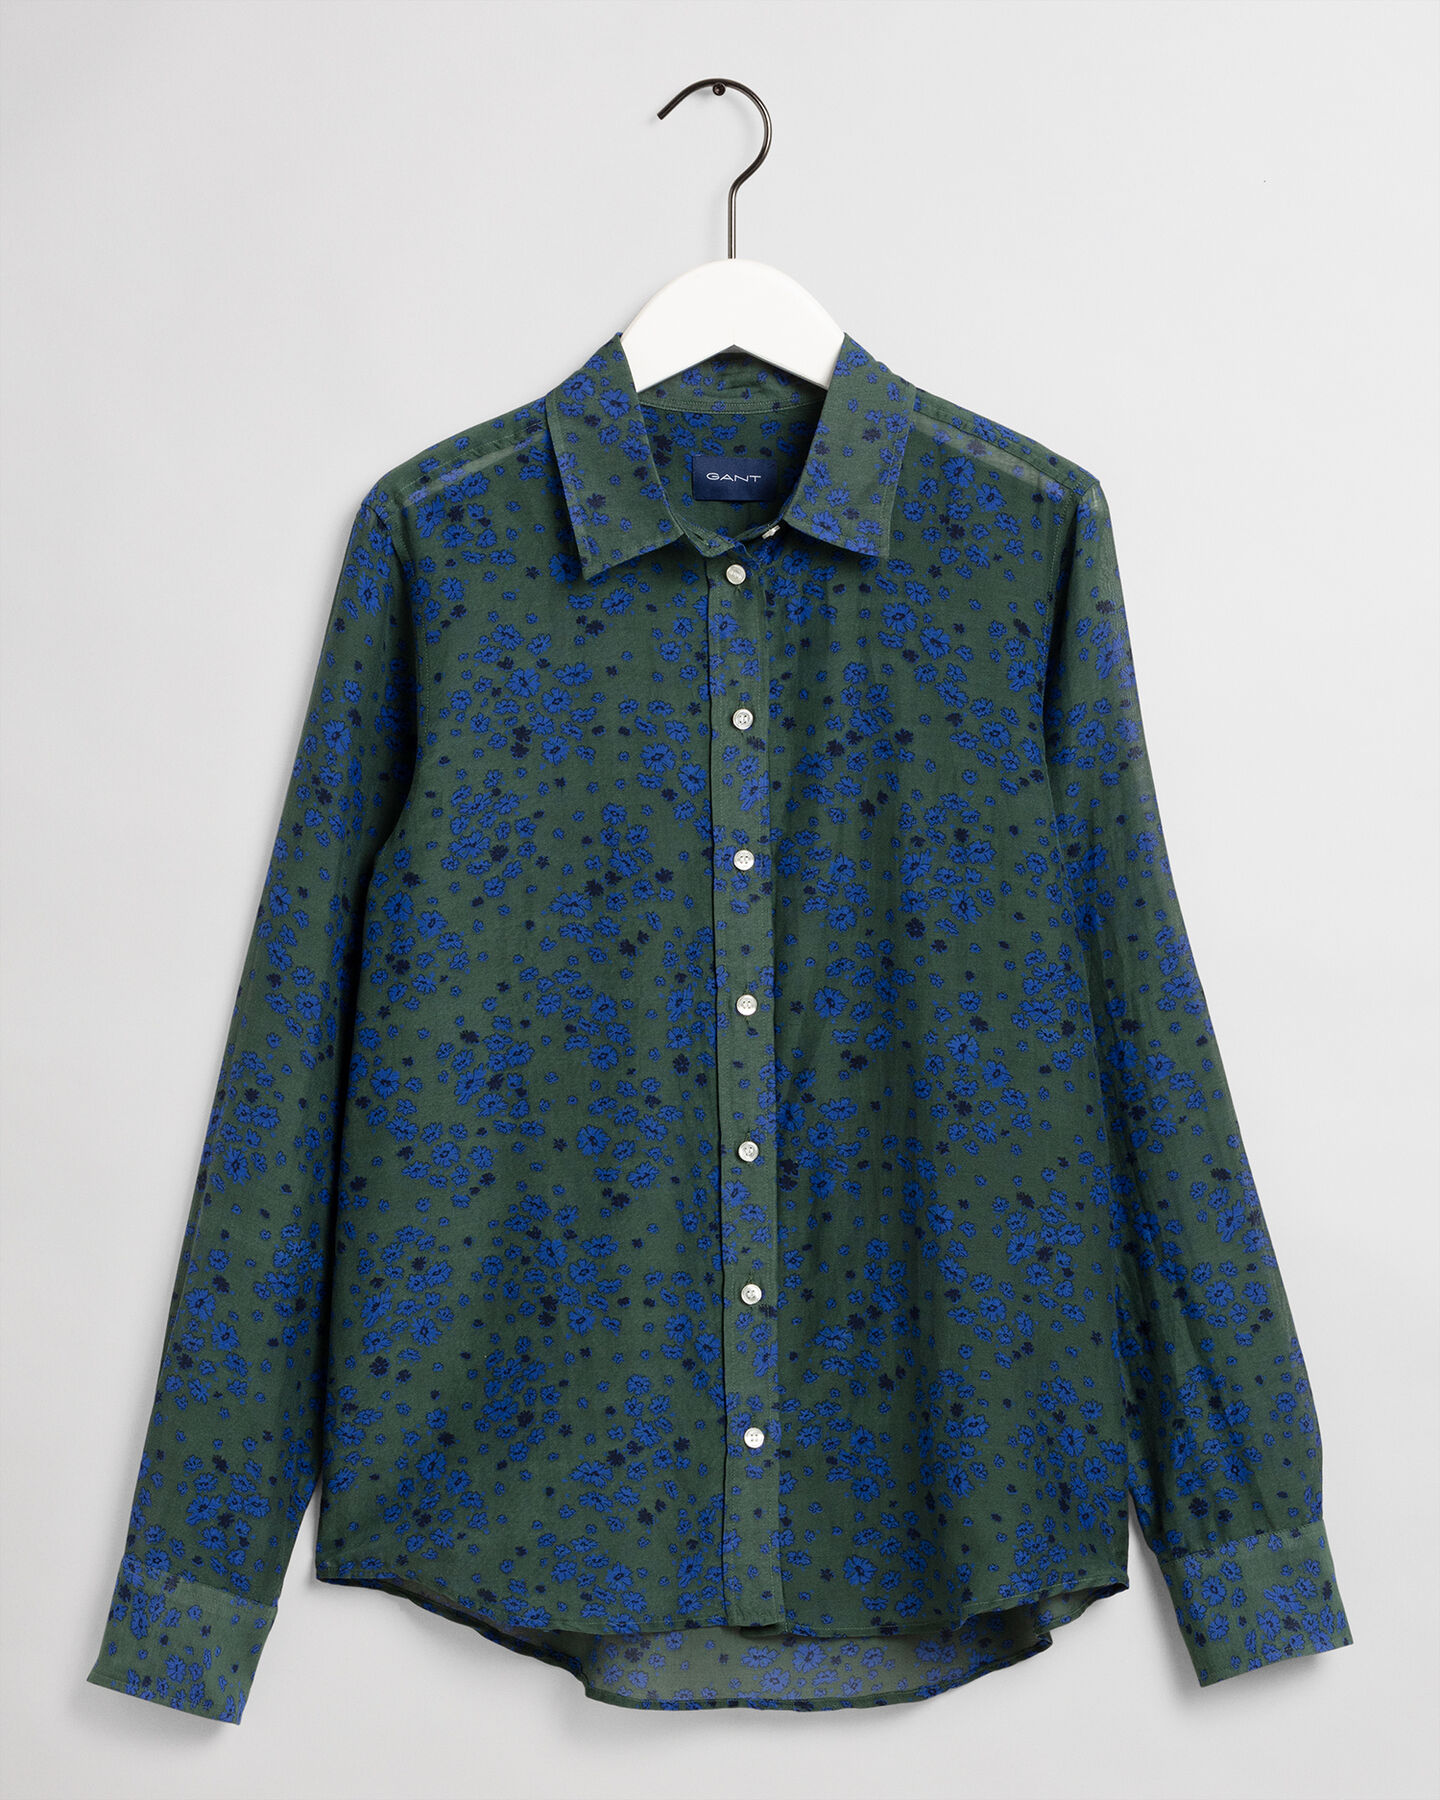 Fall Flower Baumwoll Seiden Bluse